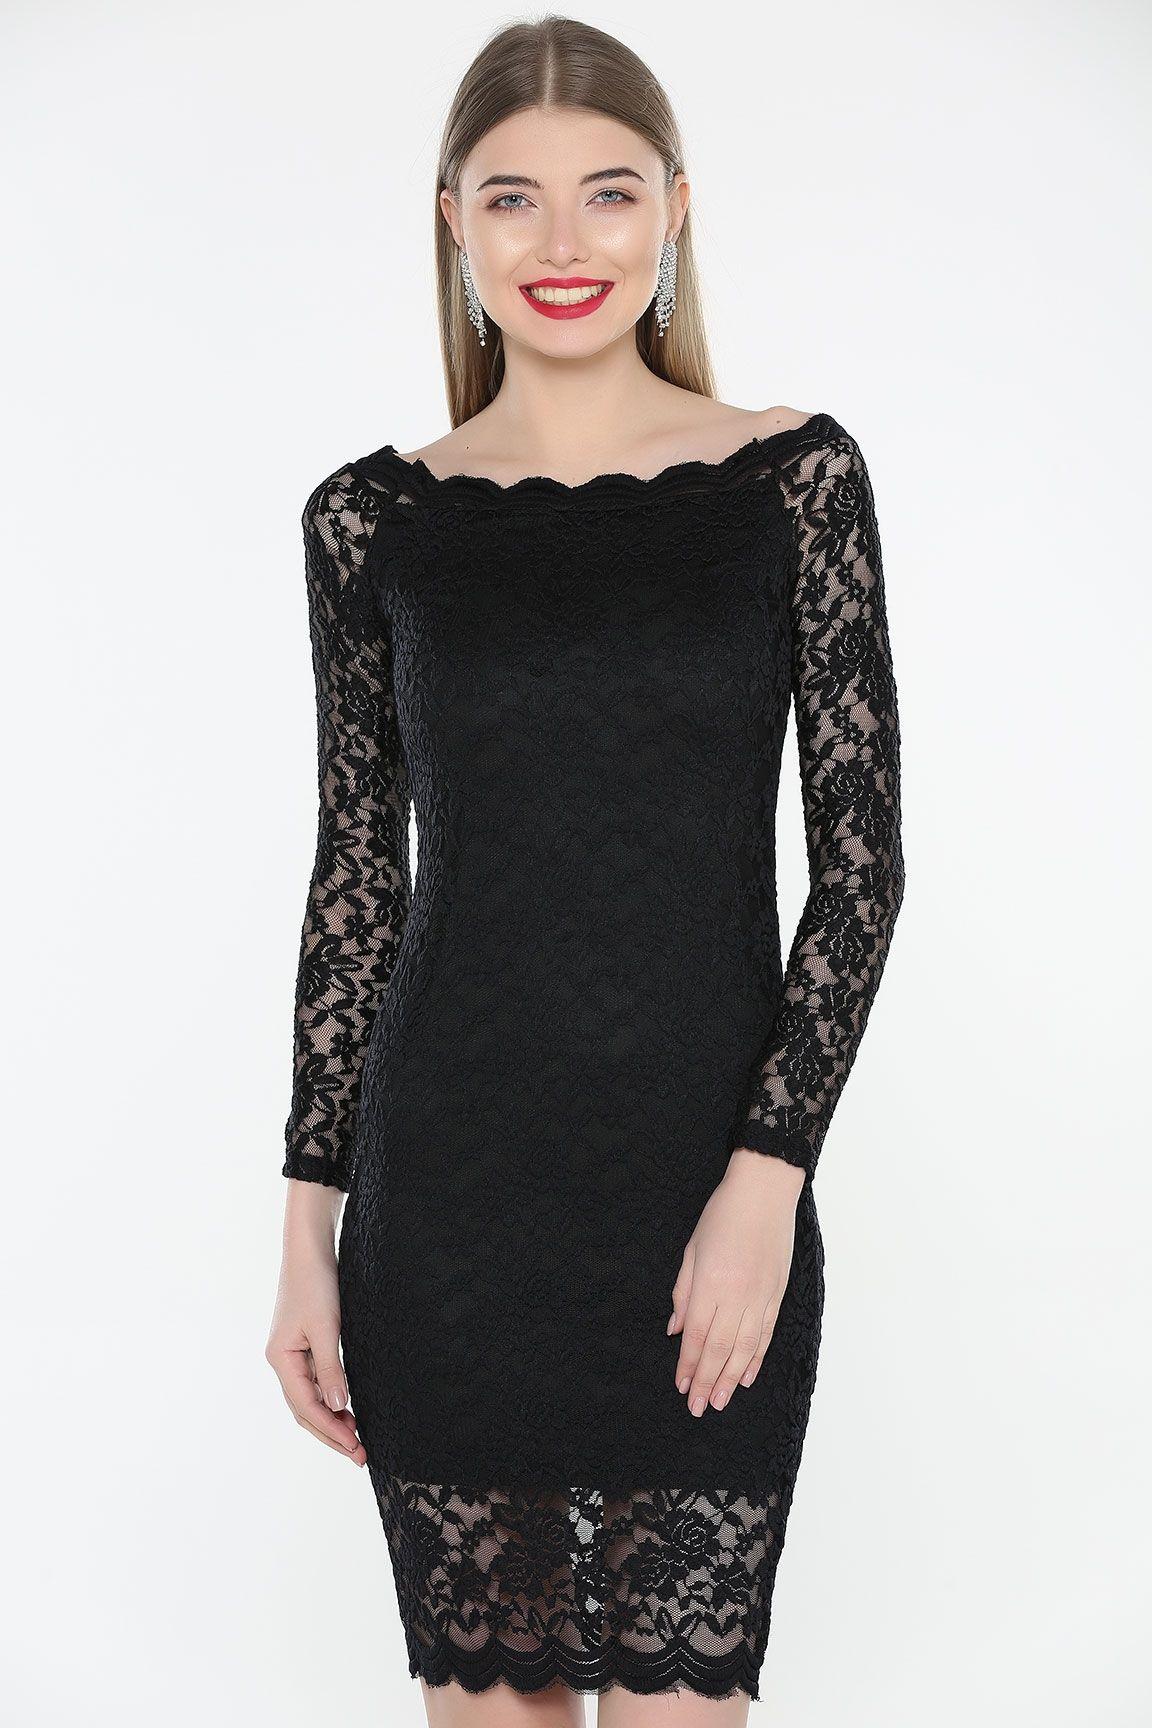 a7c0fa092 Siyah KAYIK YAKA DANTELLİ ELBİSE, 2019 | Elbise Modelleri | Elbise ...